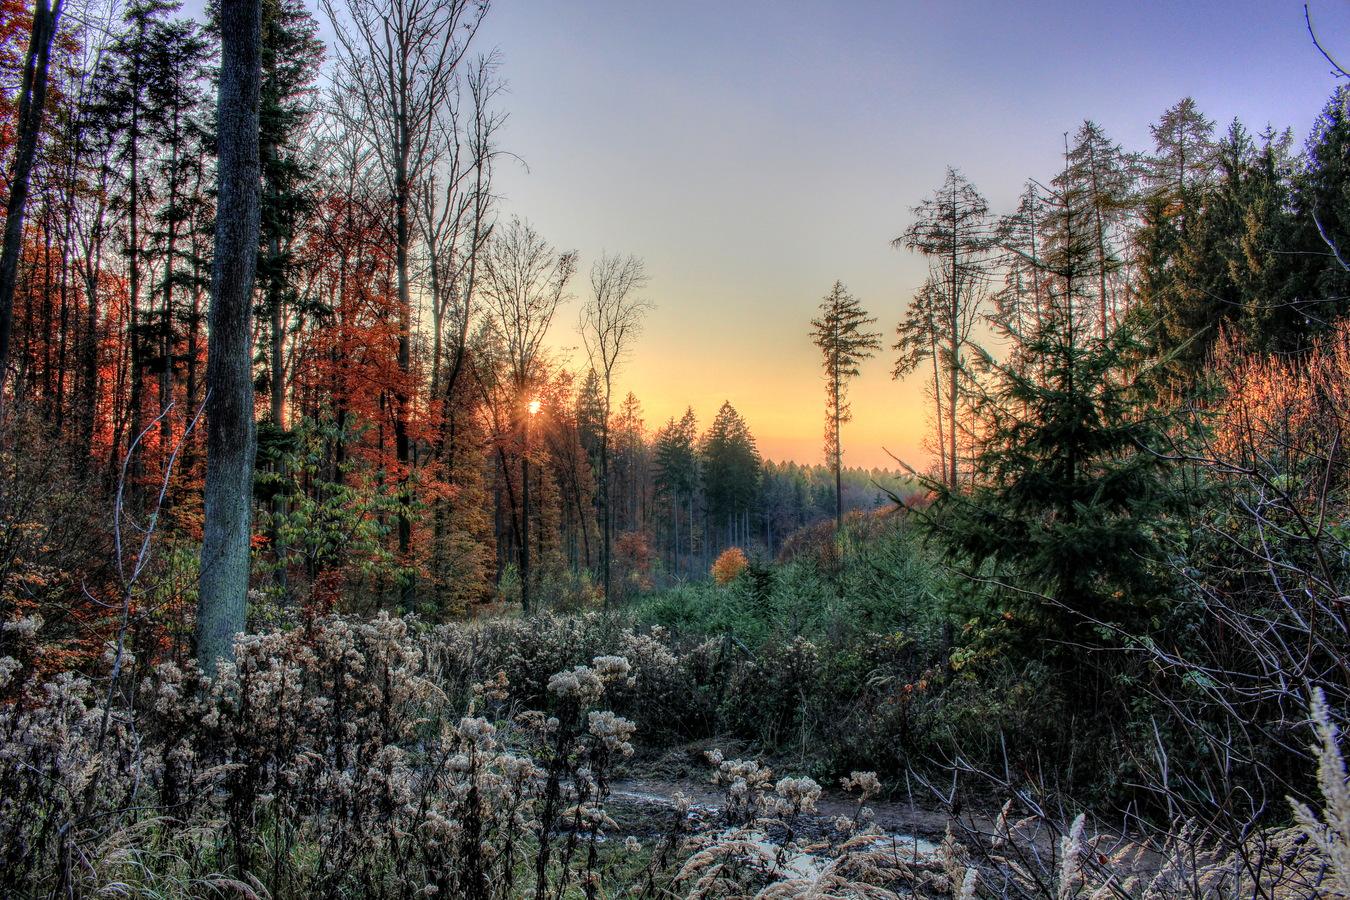 Mrazivý západ sluníčka